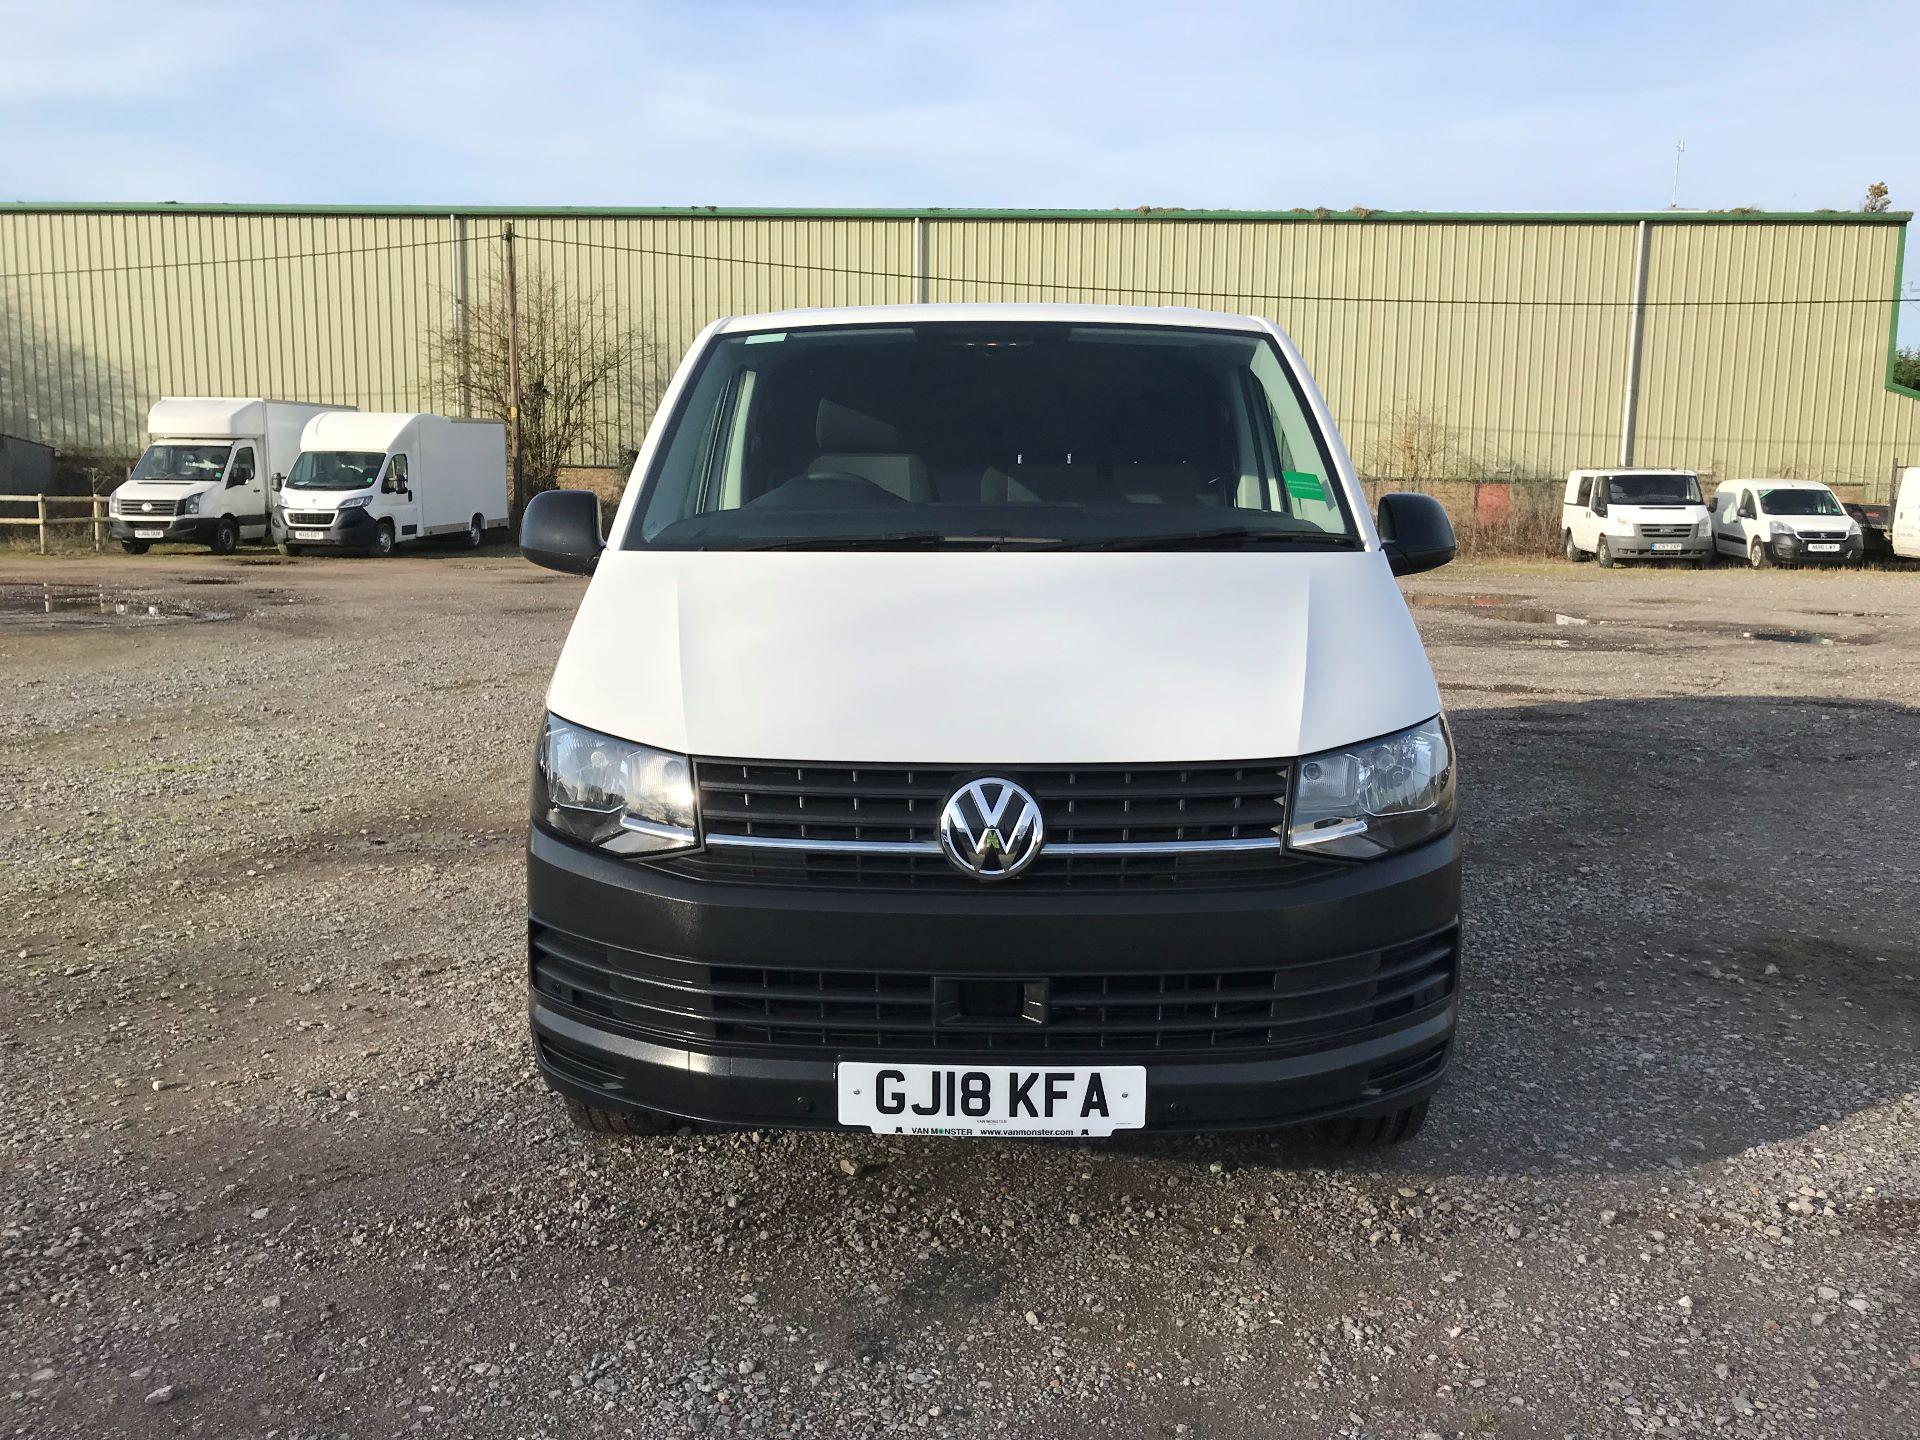 2018 Volkswagen Transporter  T30 LWB DIESEL 2.0 TDI BMT 102 STARTLINE VAN EURO 6 (GJ18KFA) Image 2